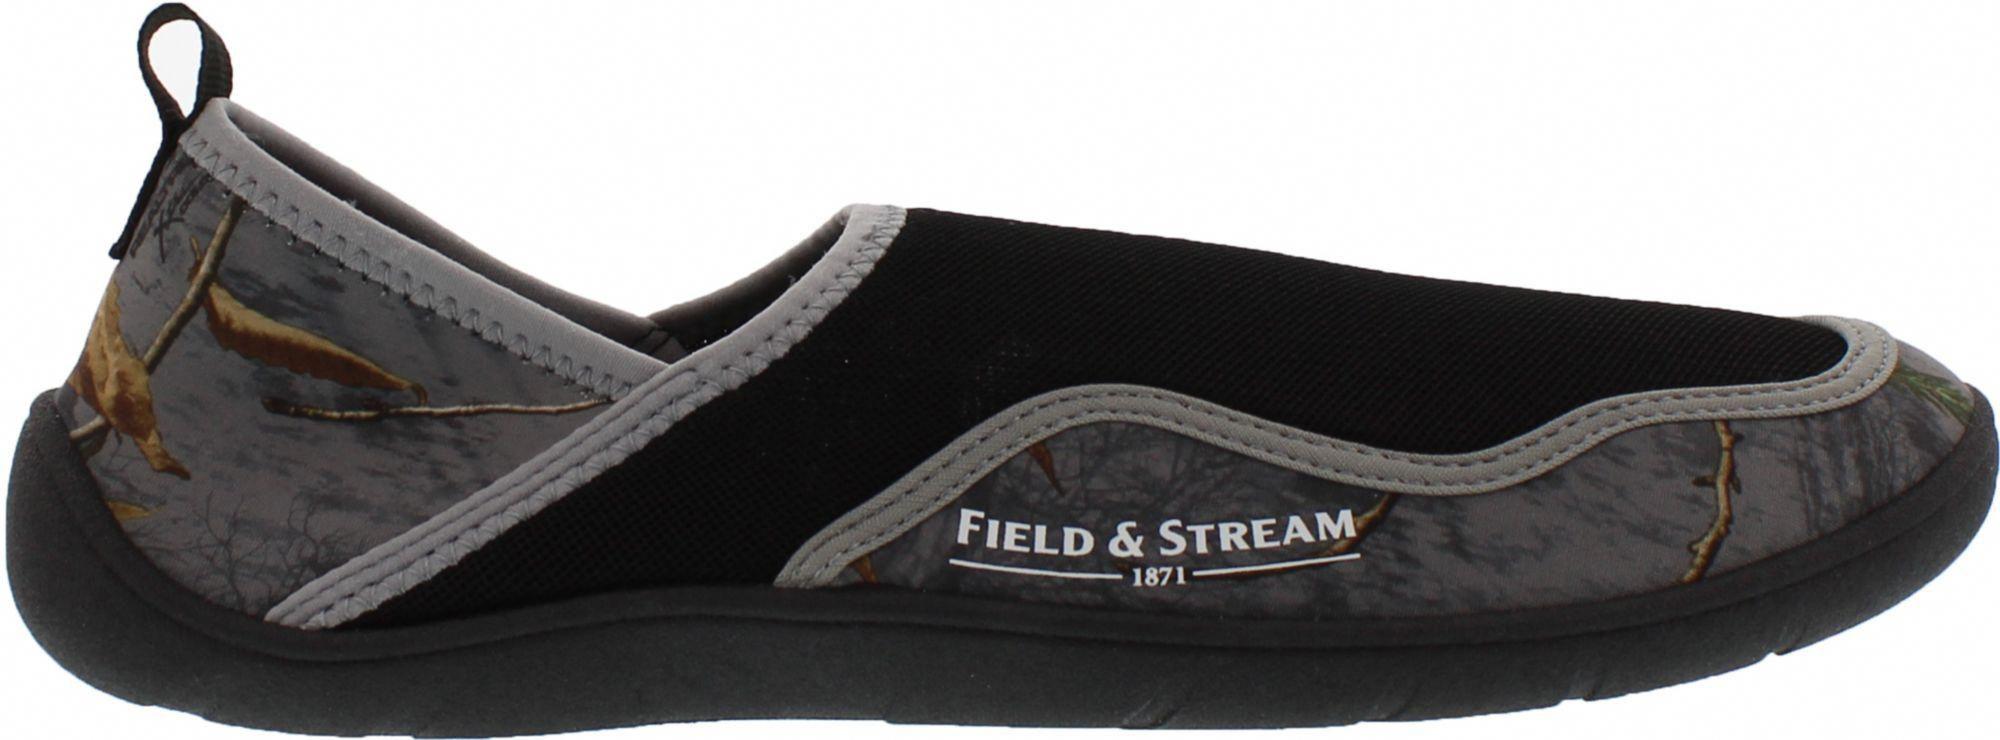 a6994e71e8ec8 Field & Stream Men's Realtree Xtra Water Shoes, Brown #WaterShoesForCruise